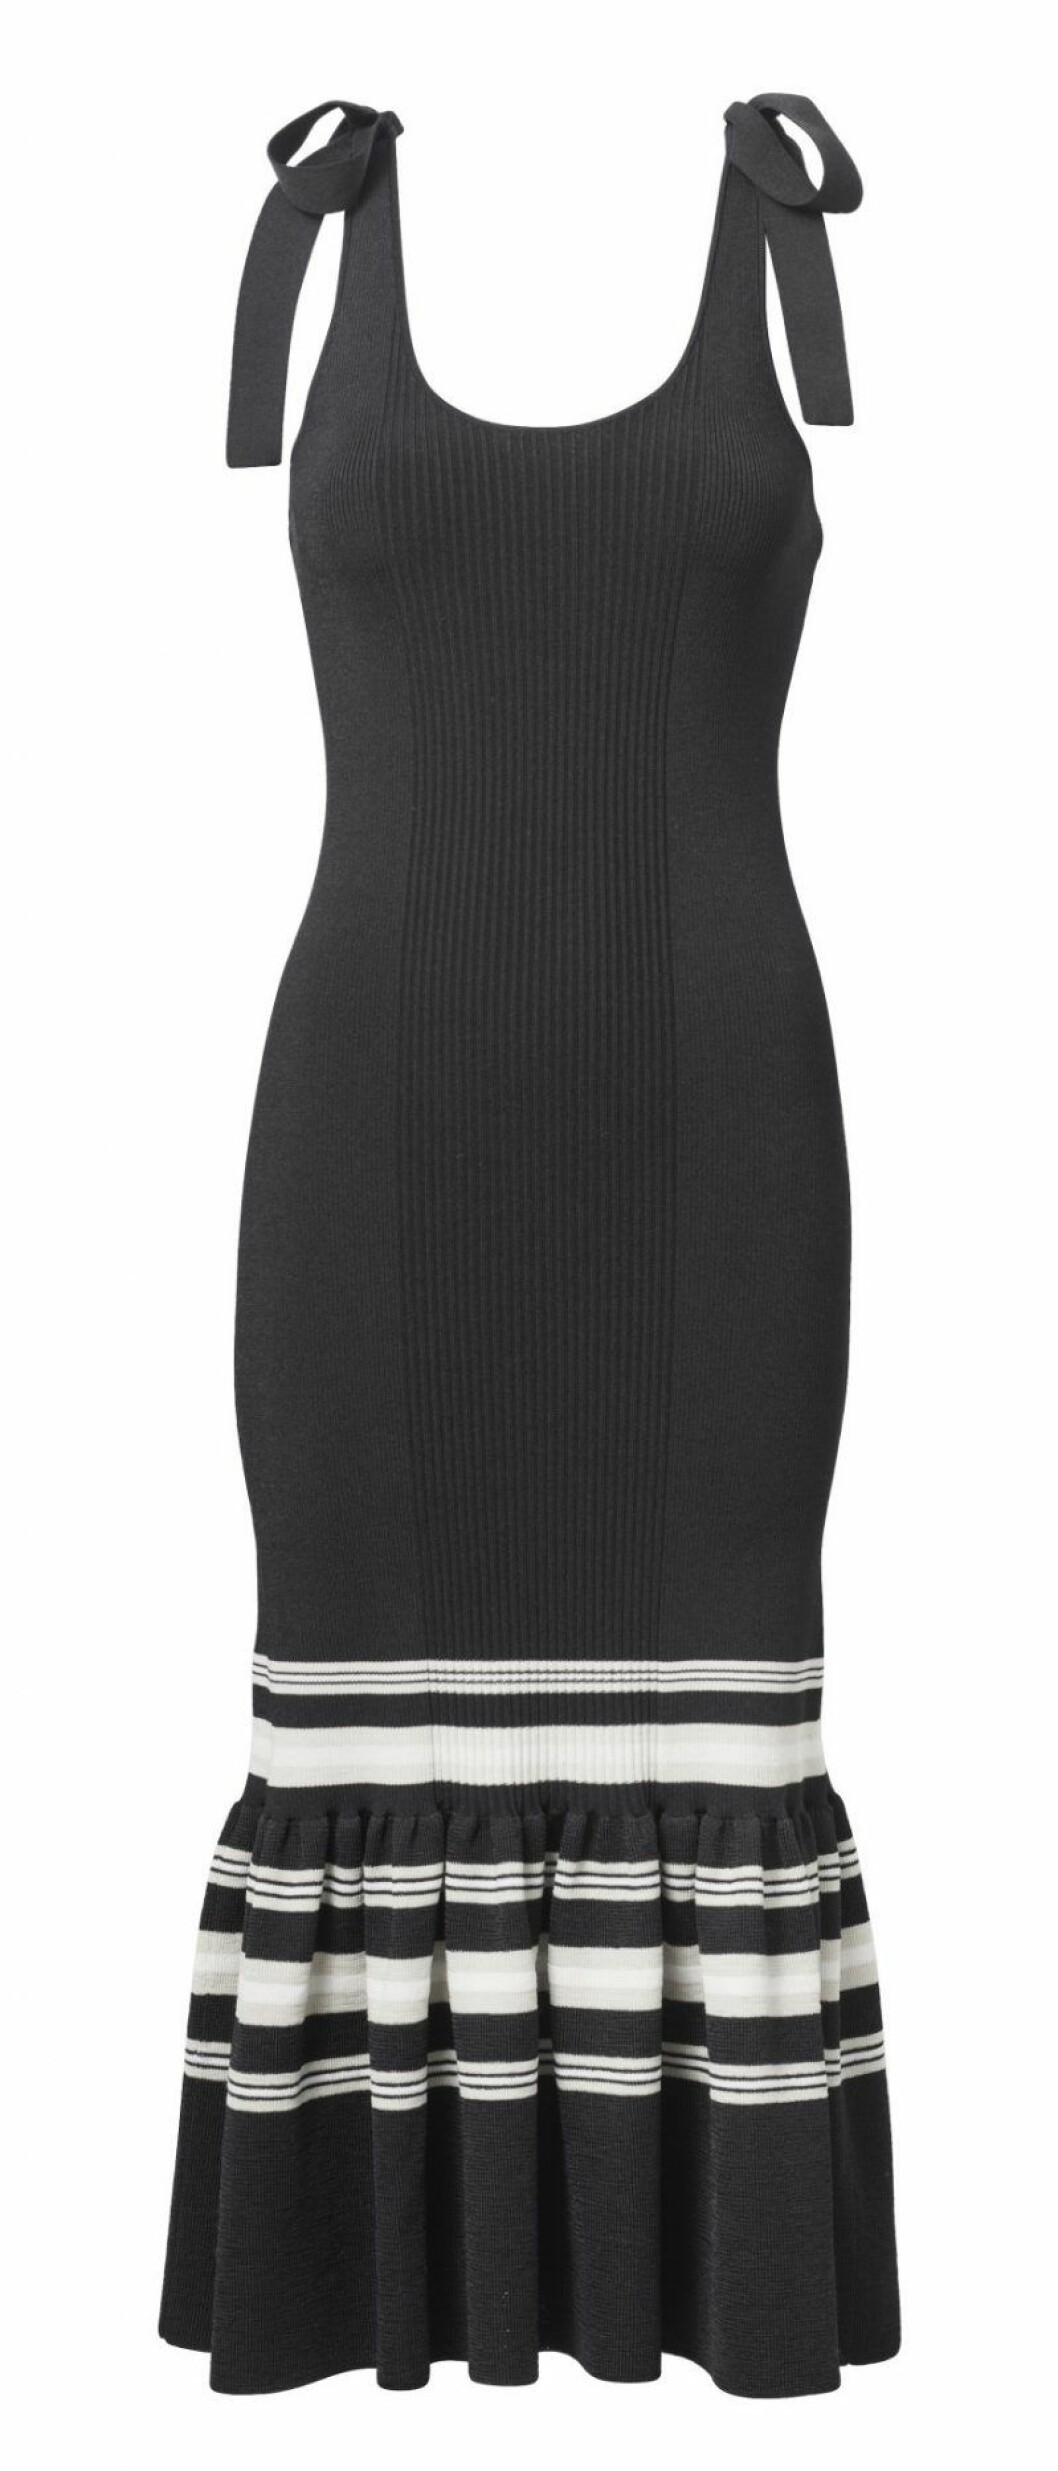 H&M Conscious Exclusive SS20 stickad klänning